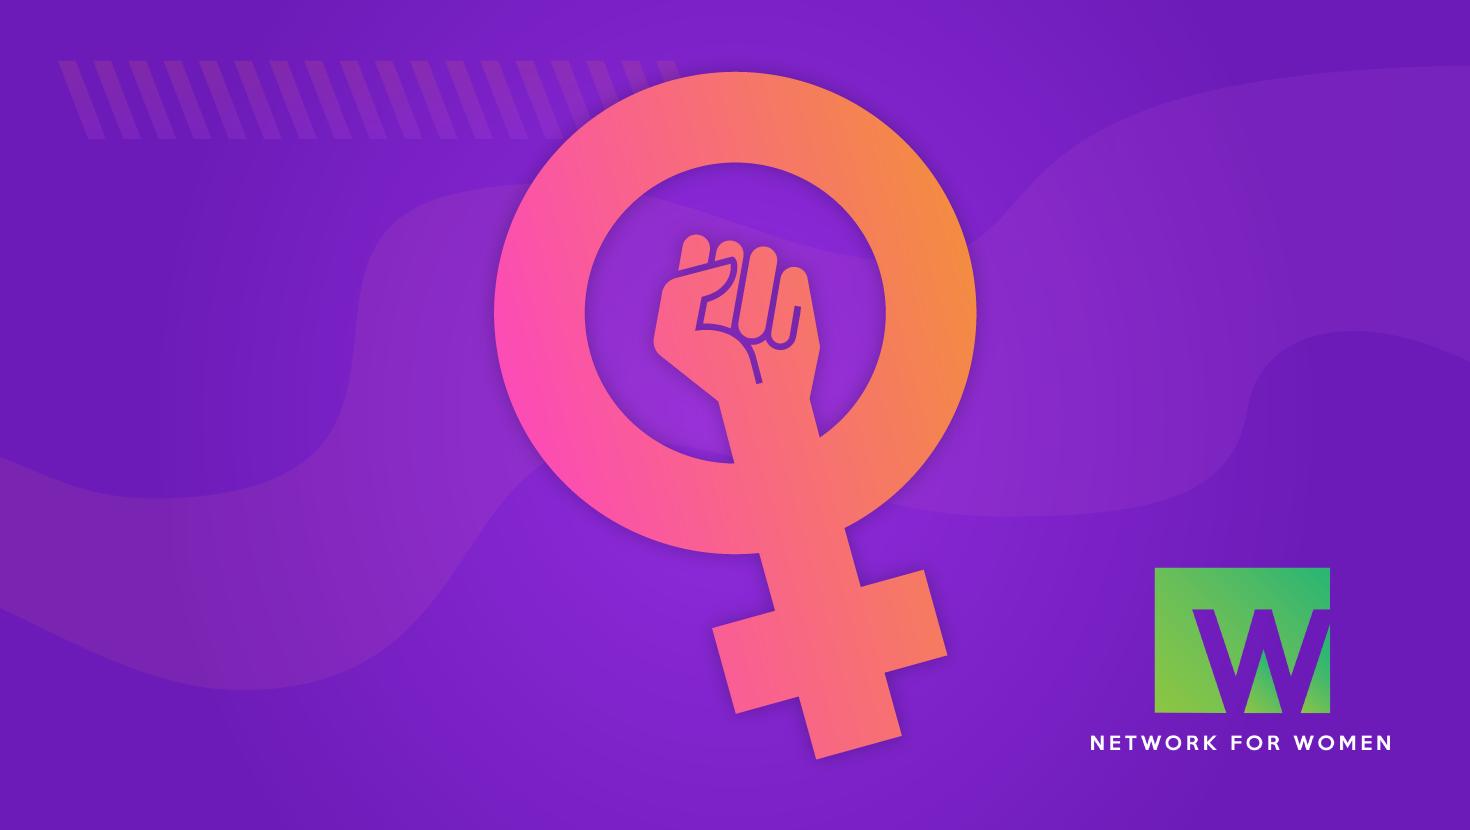 Feminist symbol with the N4W logo